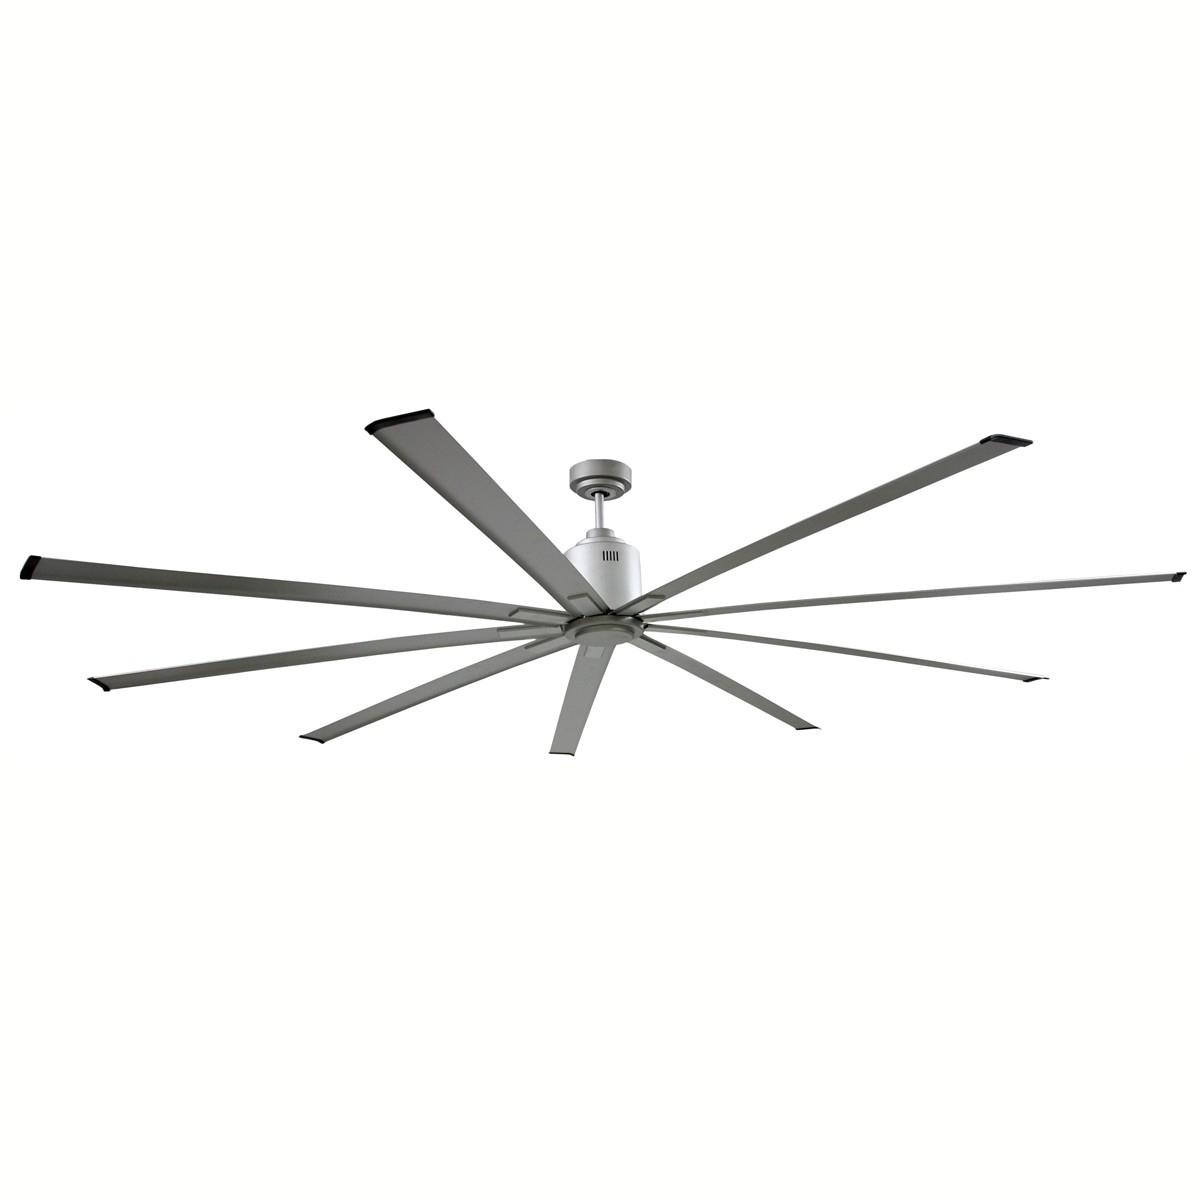 Favorite 96 Inch Indoor Industrial Ceiling Fan Pertaining To Industrial Outdoor Ceiling Fans (View 3 of 20)